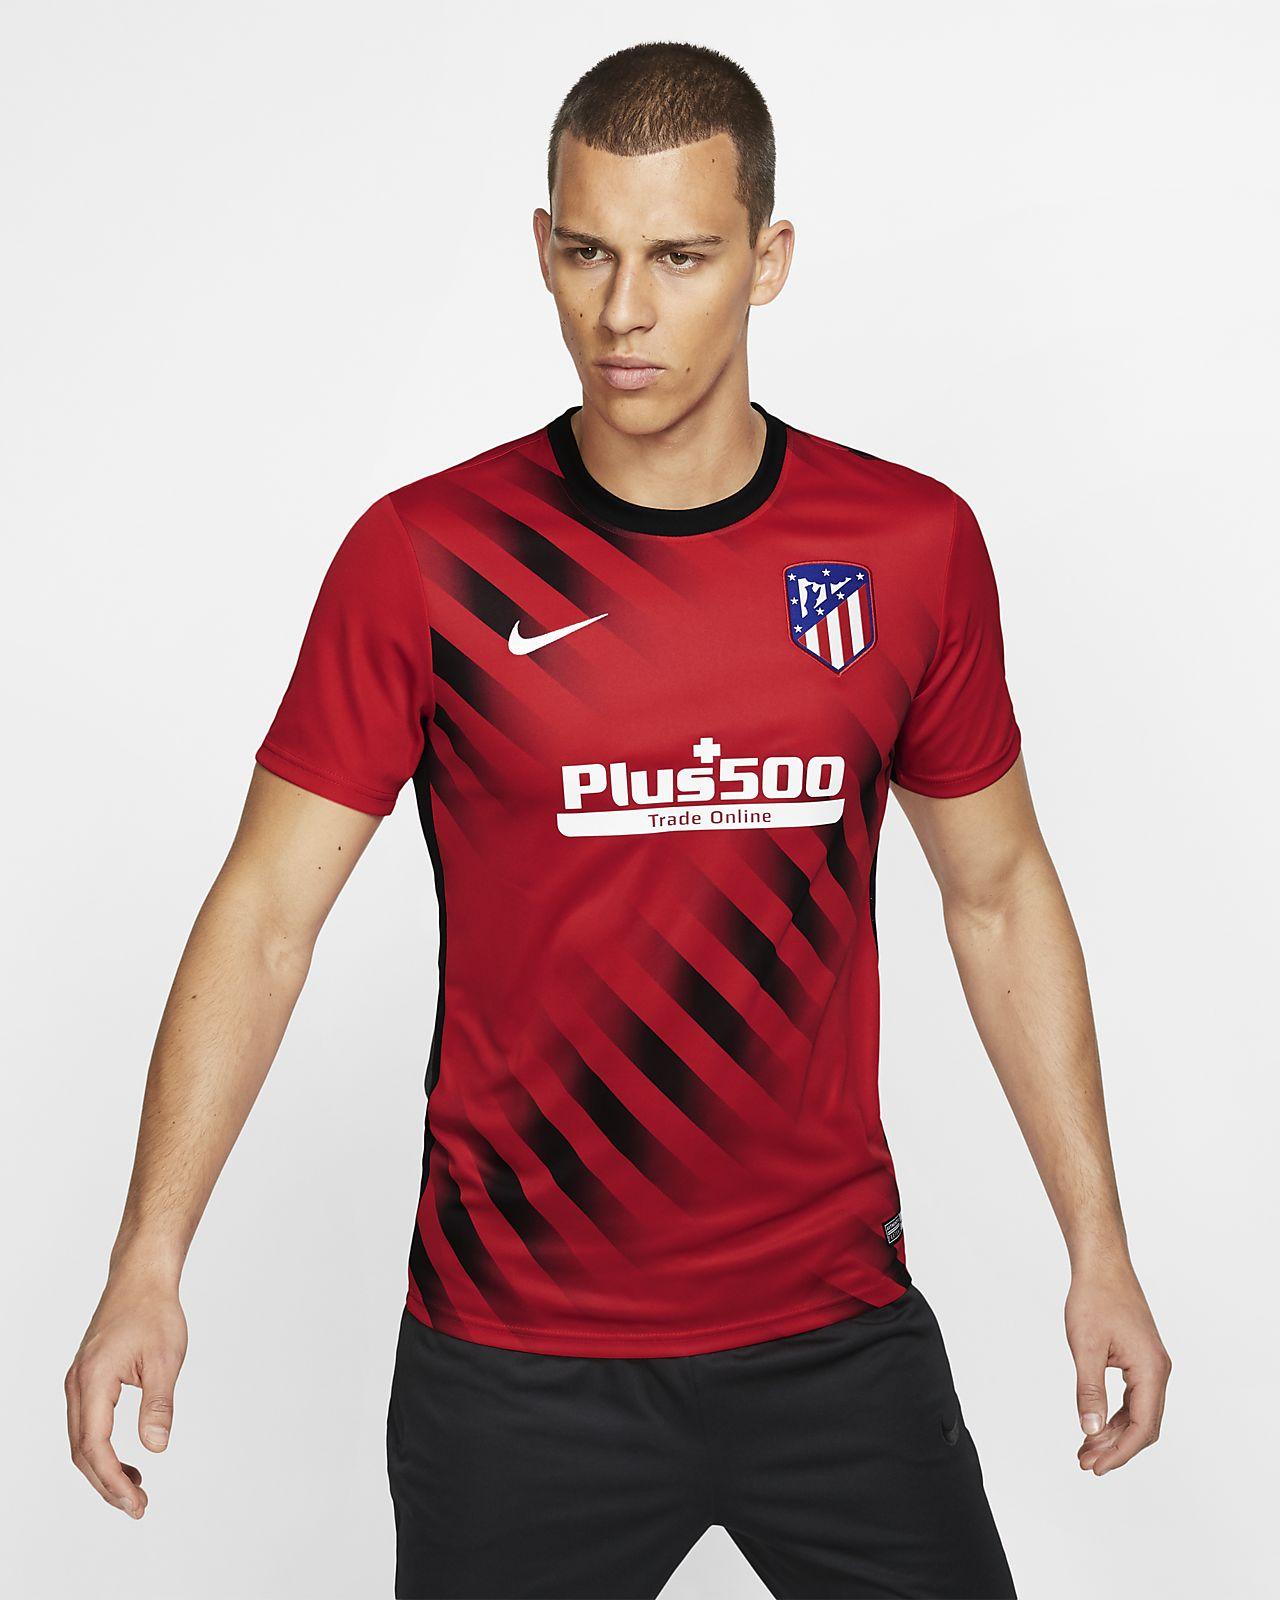 Męska koszulka piłkarska z krótkim rękawem Atlético de Madrid